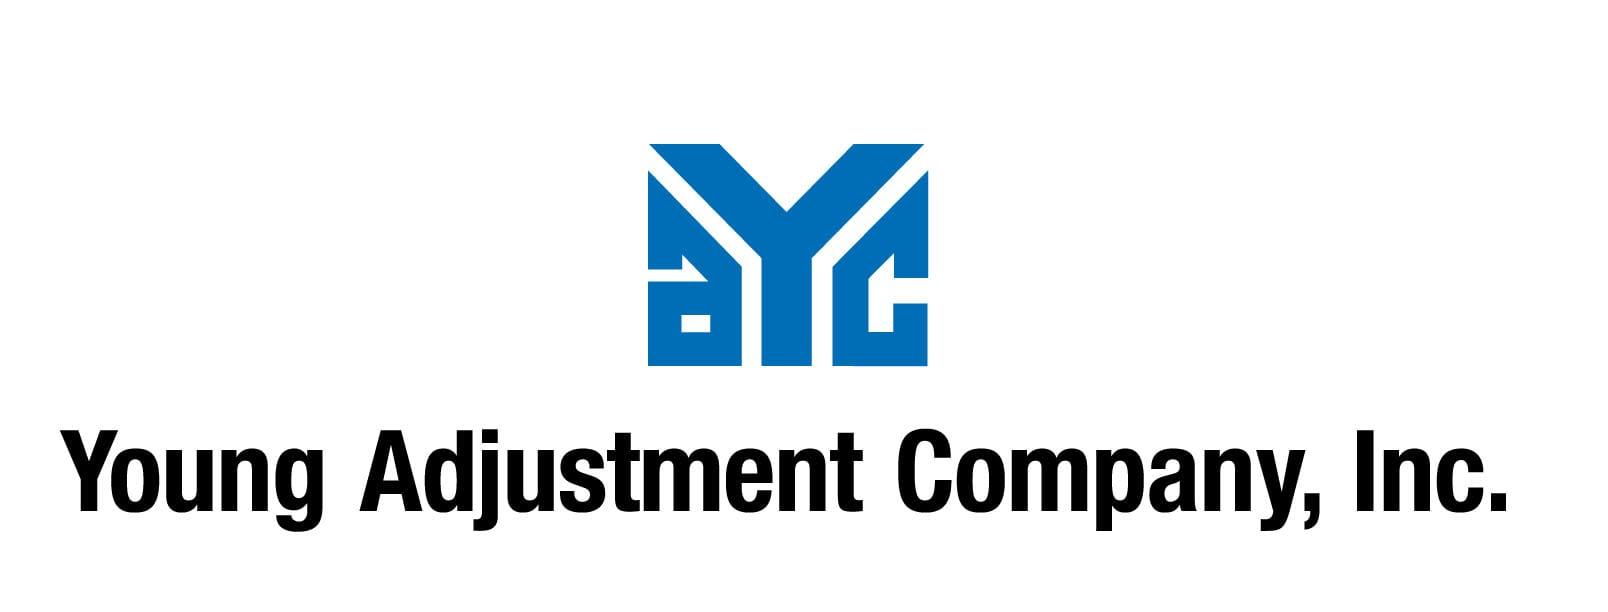 YOUNG ADJUSTMENT COMPANY_Alternate-min